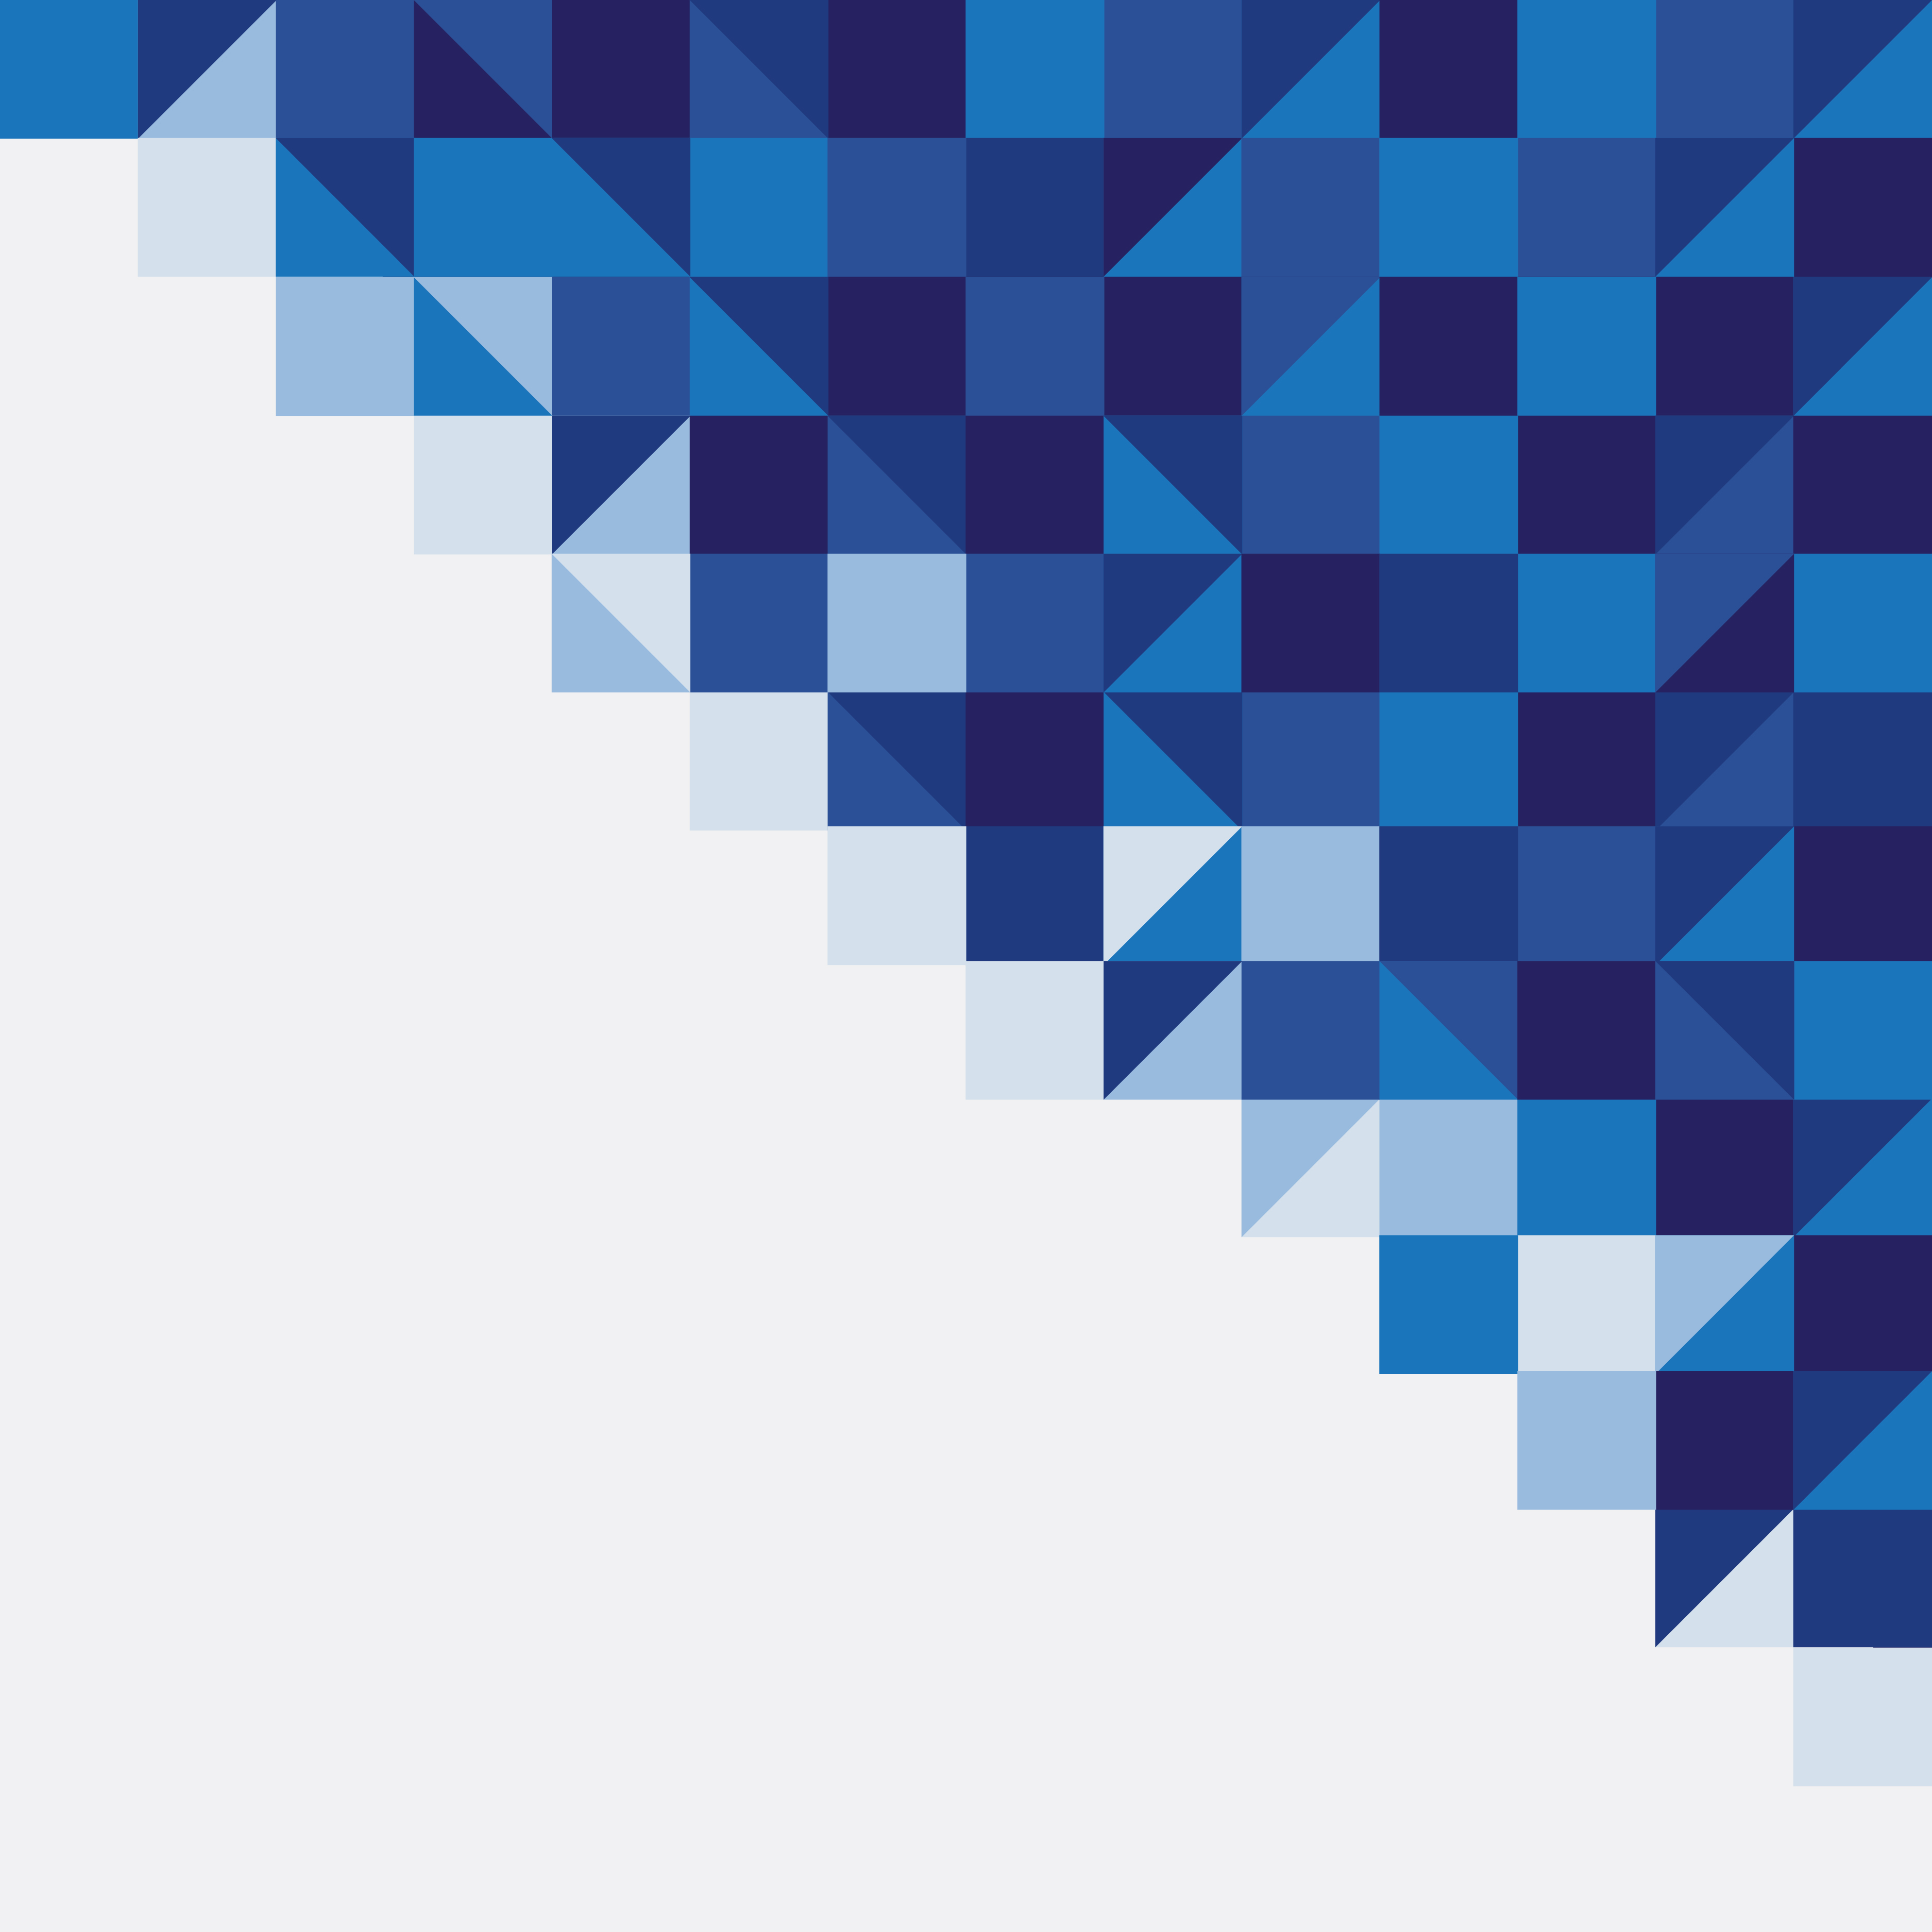 portada del disco de fondo la geometr u00eda azul cambio